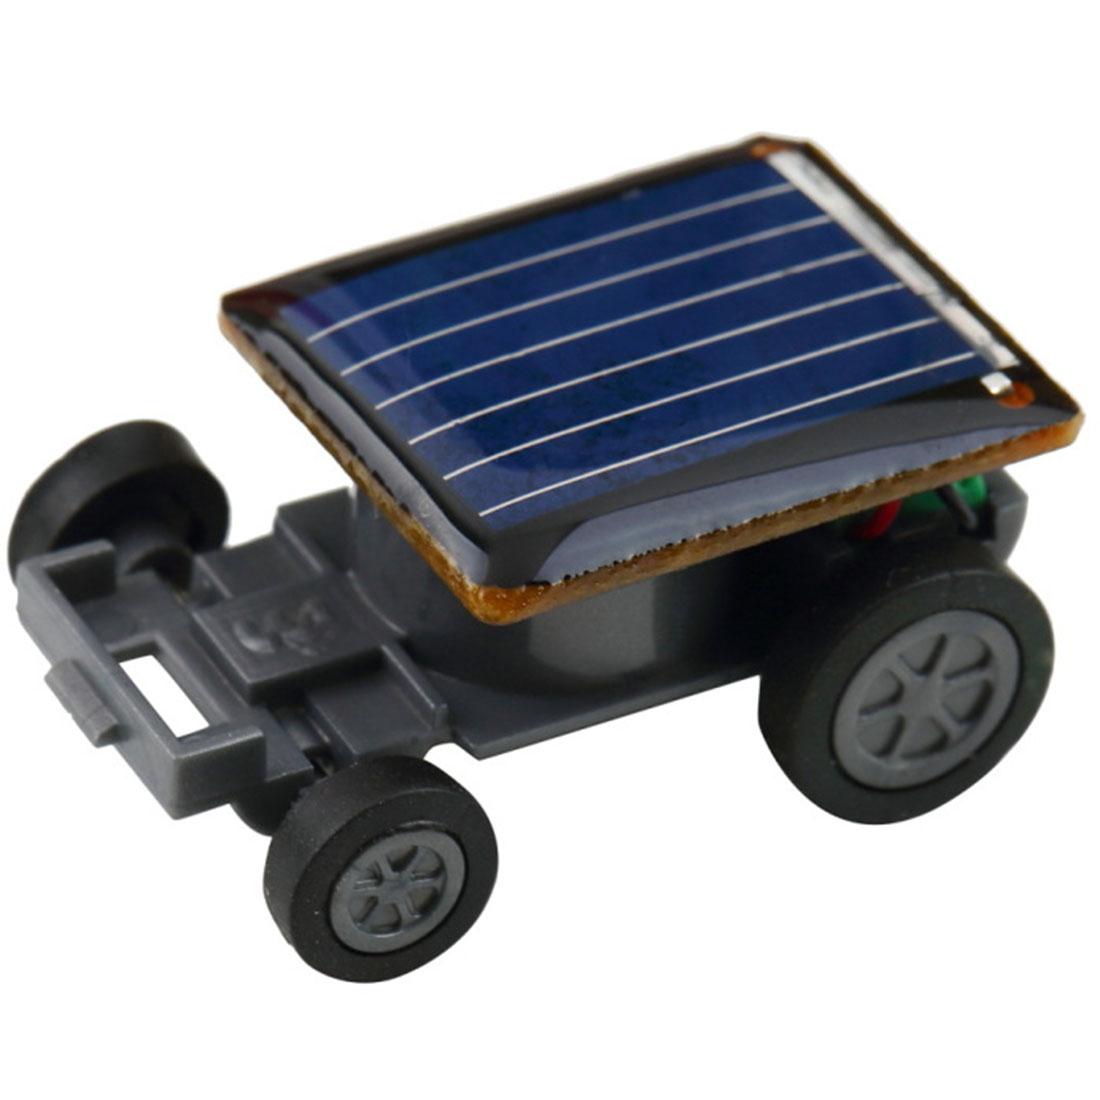 Smallest Funny Mini Solar Powered Robot Auto Car Toys for Children Kids - Black(China (Mainland))